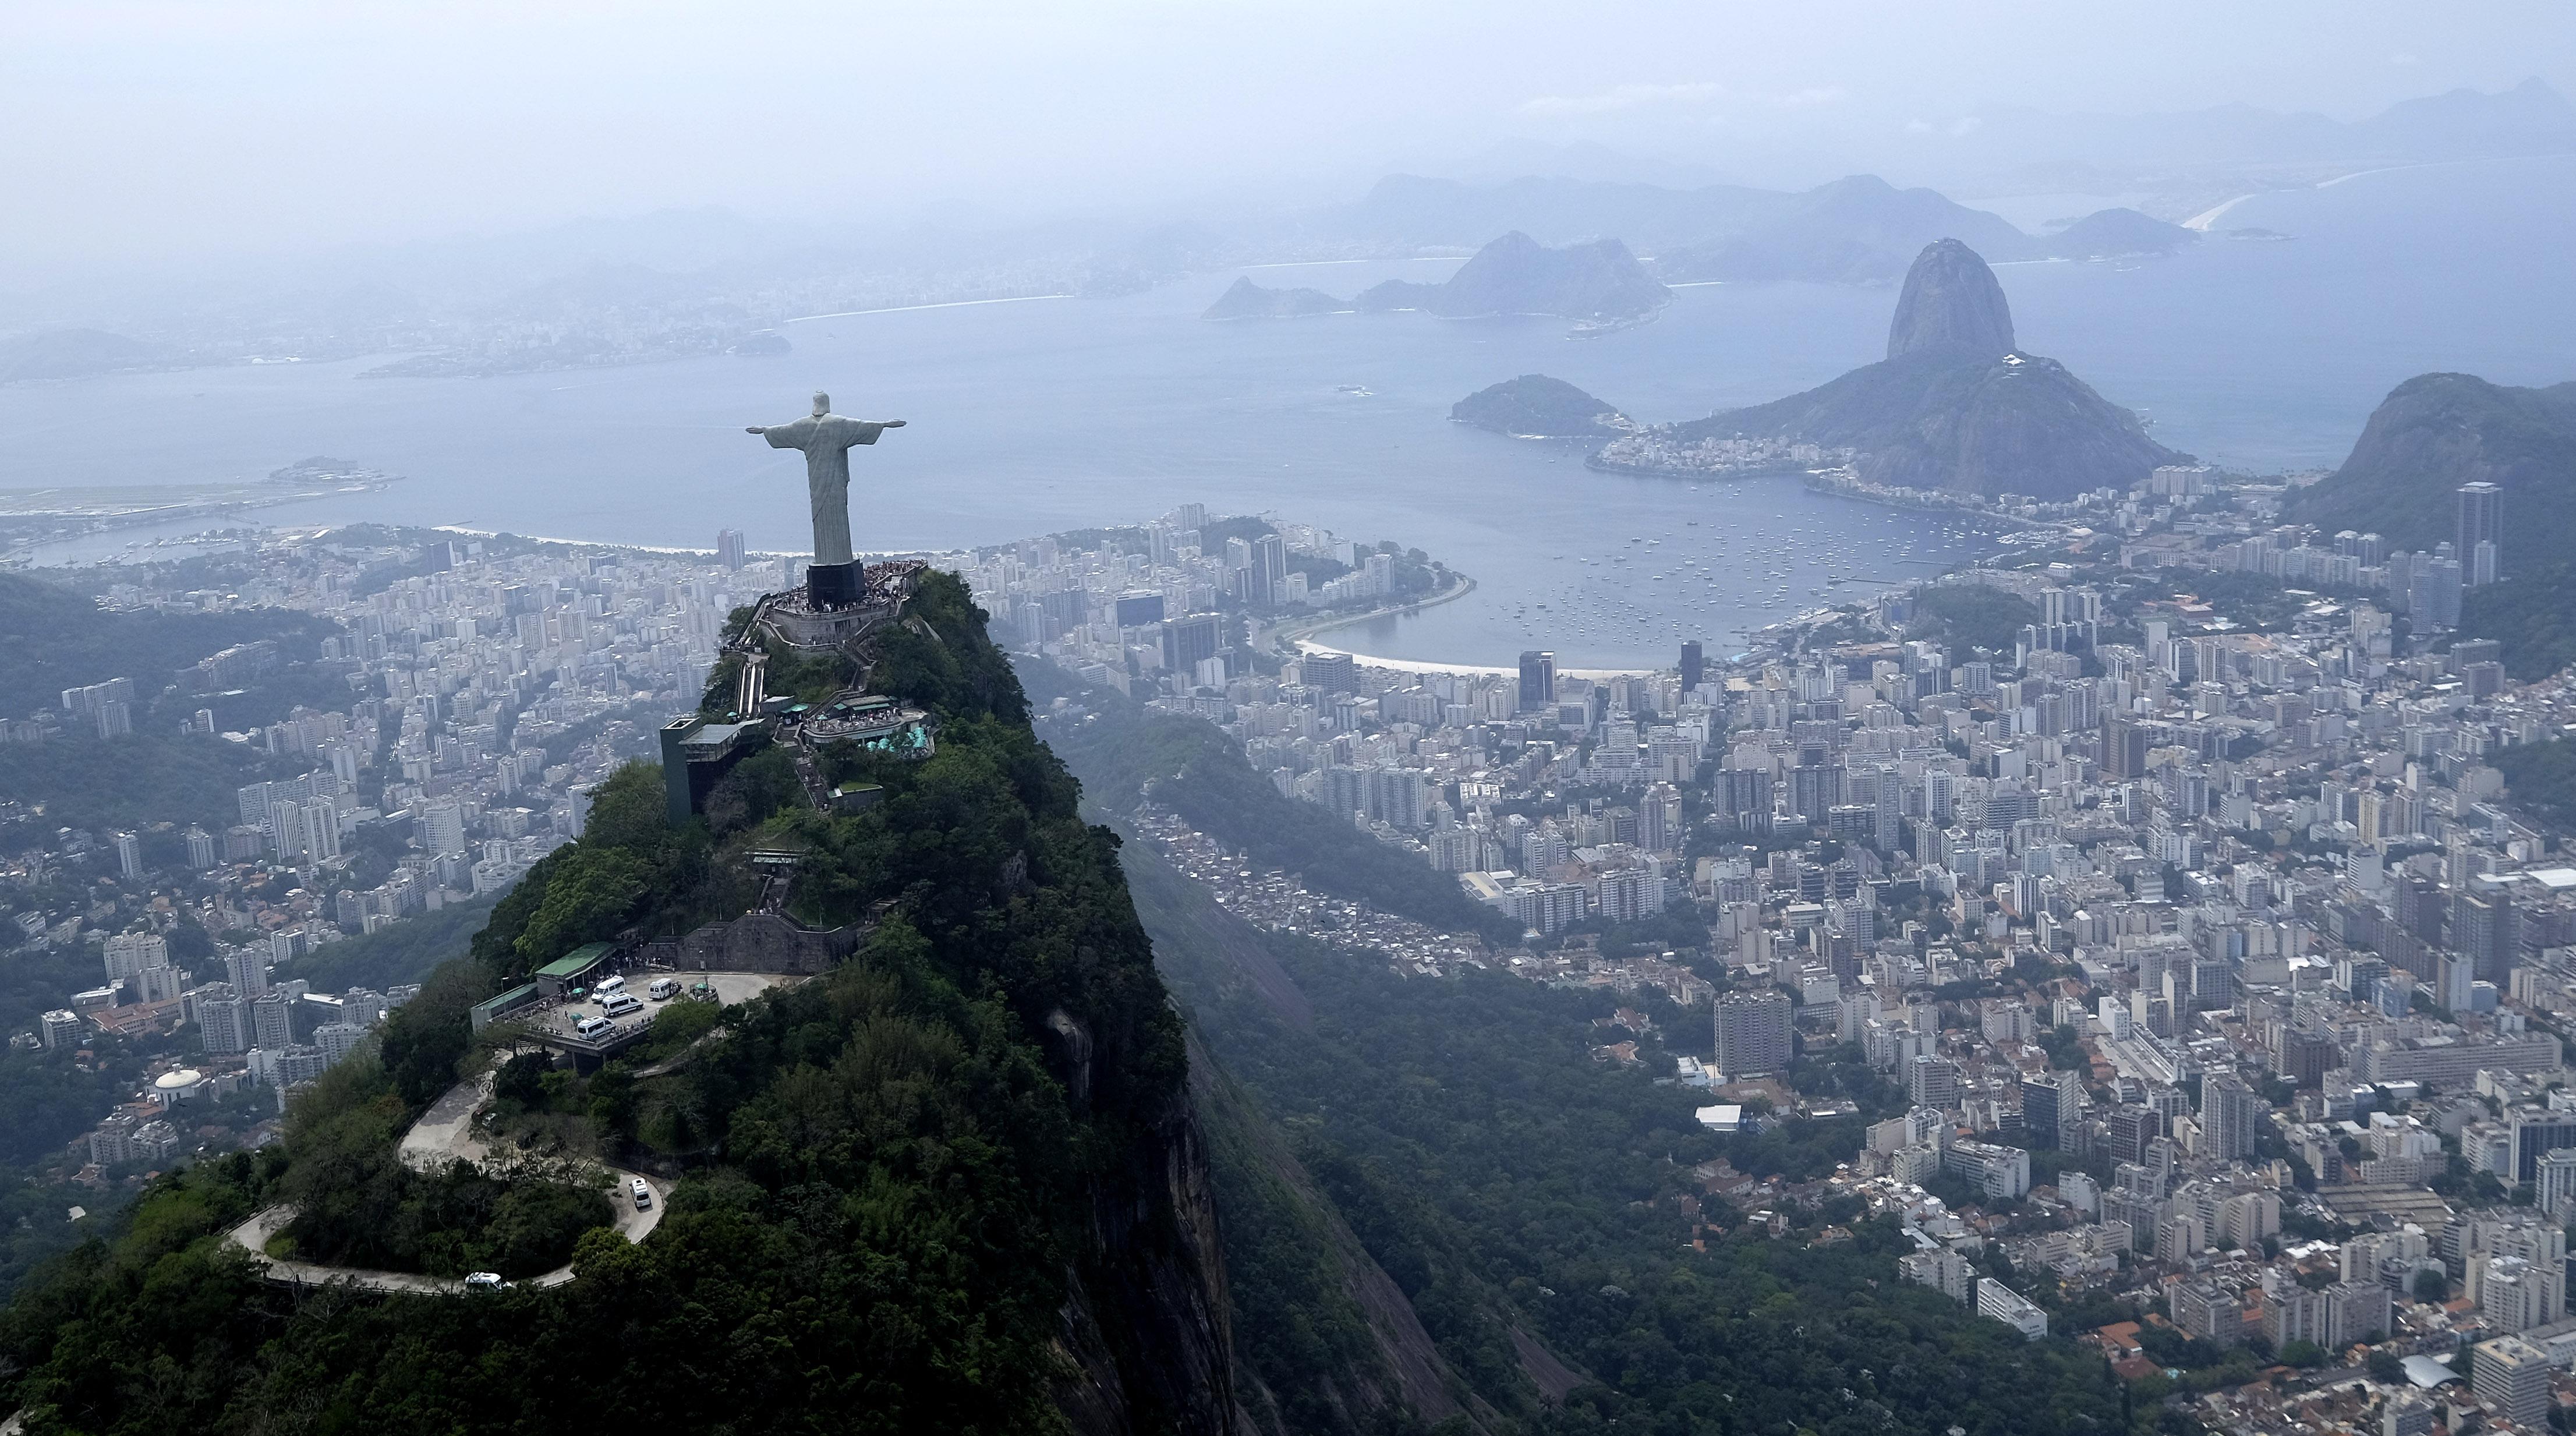 The Christ the Redeemer statue in Rio de Janeiro, Brazil, in Oct. 2015.